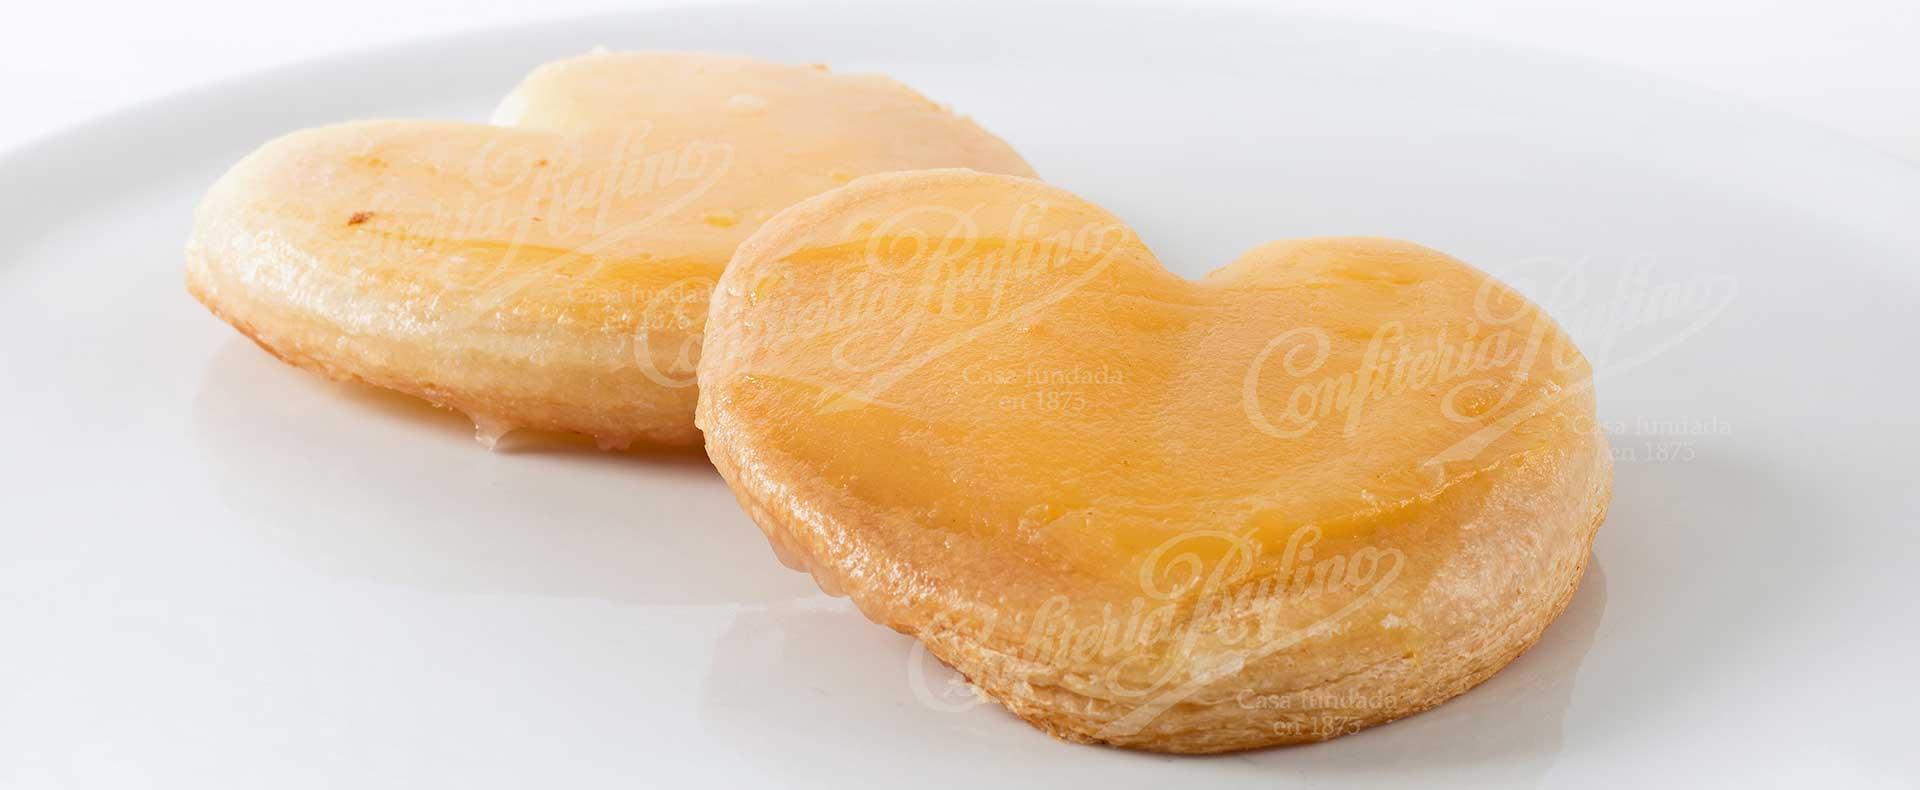 palmera-huevo-confiteria-rufino-aracena